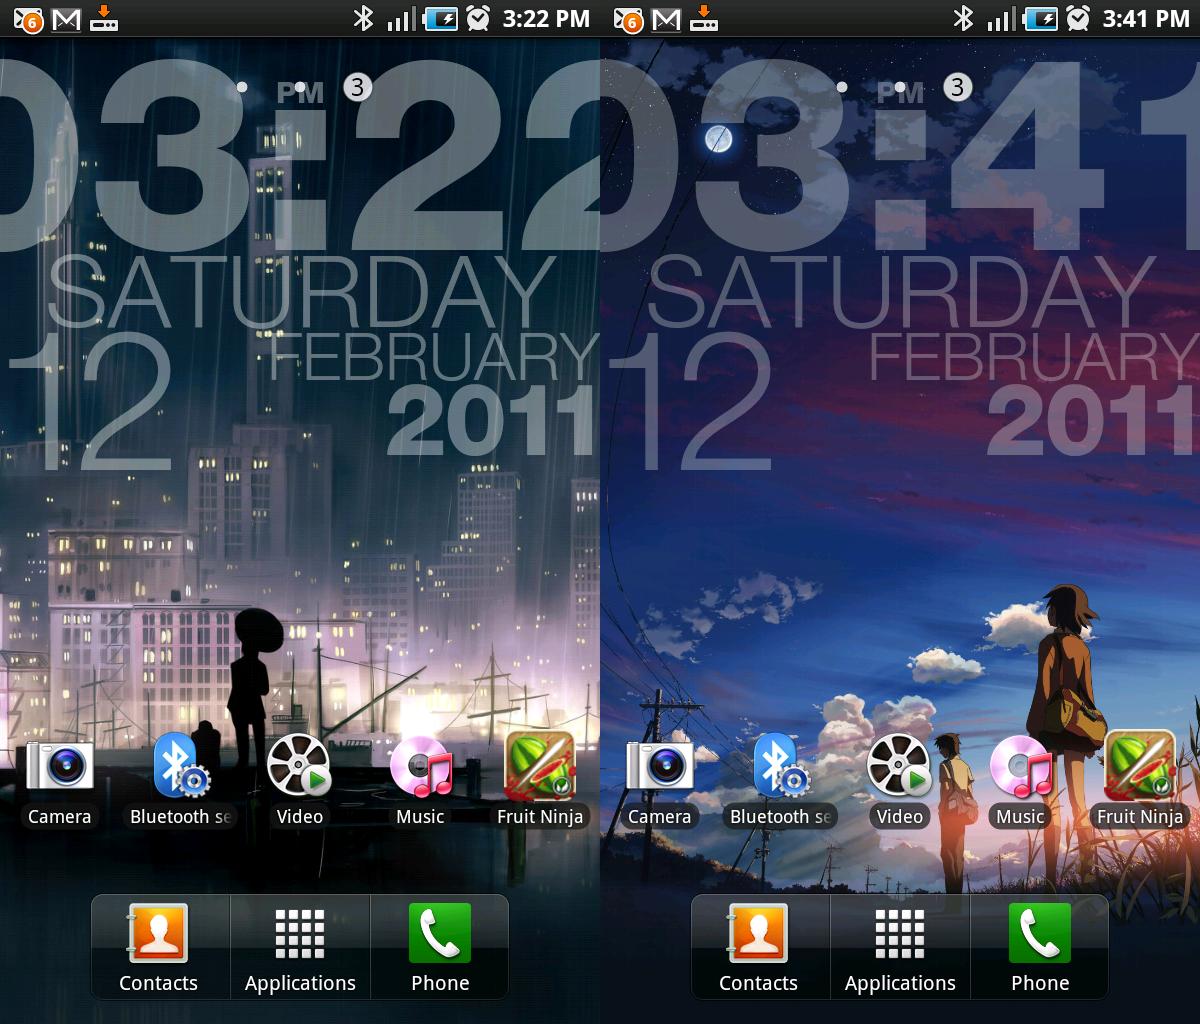 50+ Live Wallpapers for Samsung Tablet on WallpaperSafari